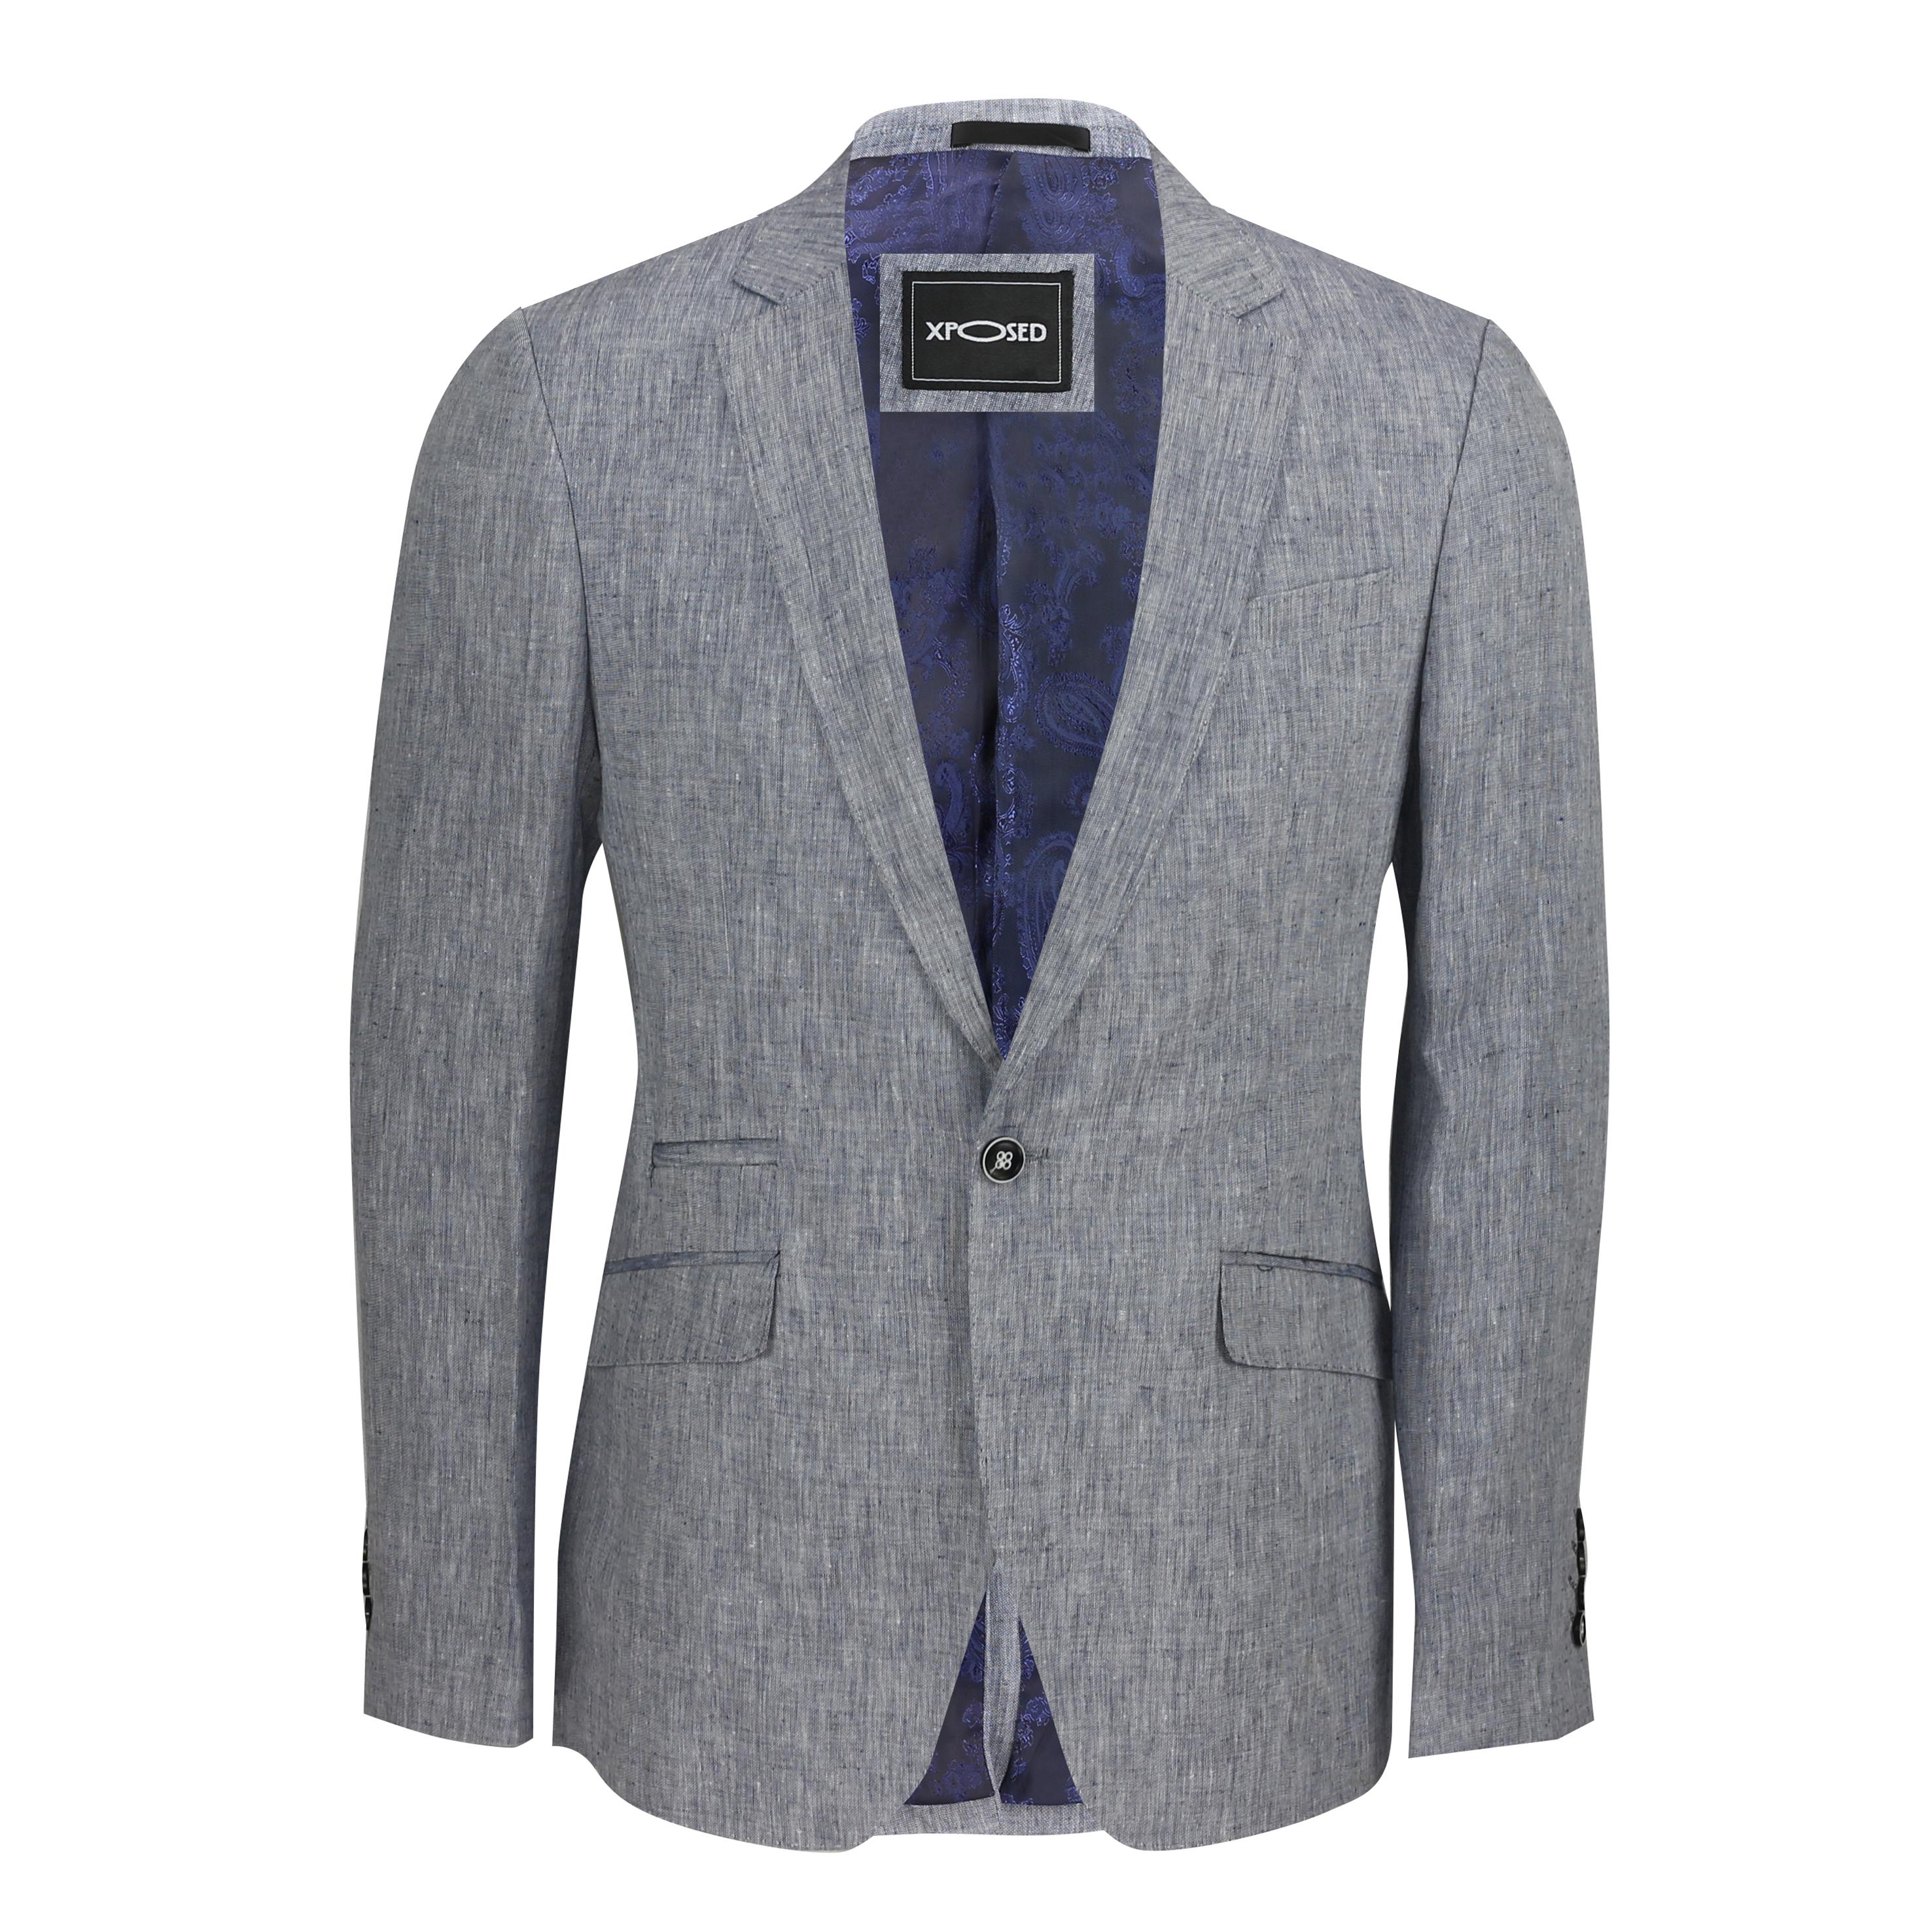 Mens Vintage Cotton Linen Blend Slim Fit Blazer Smart